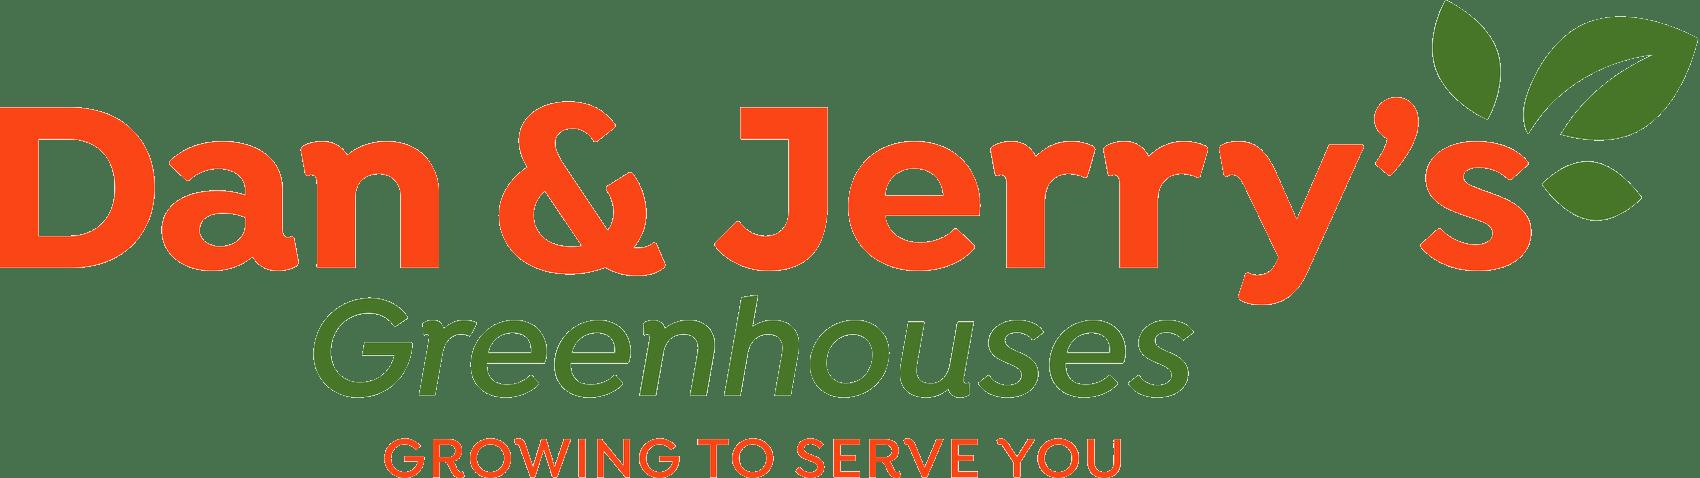 Dan & Jerry's Greenhouses